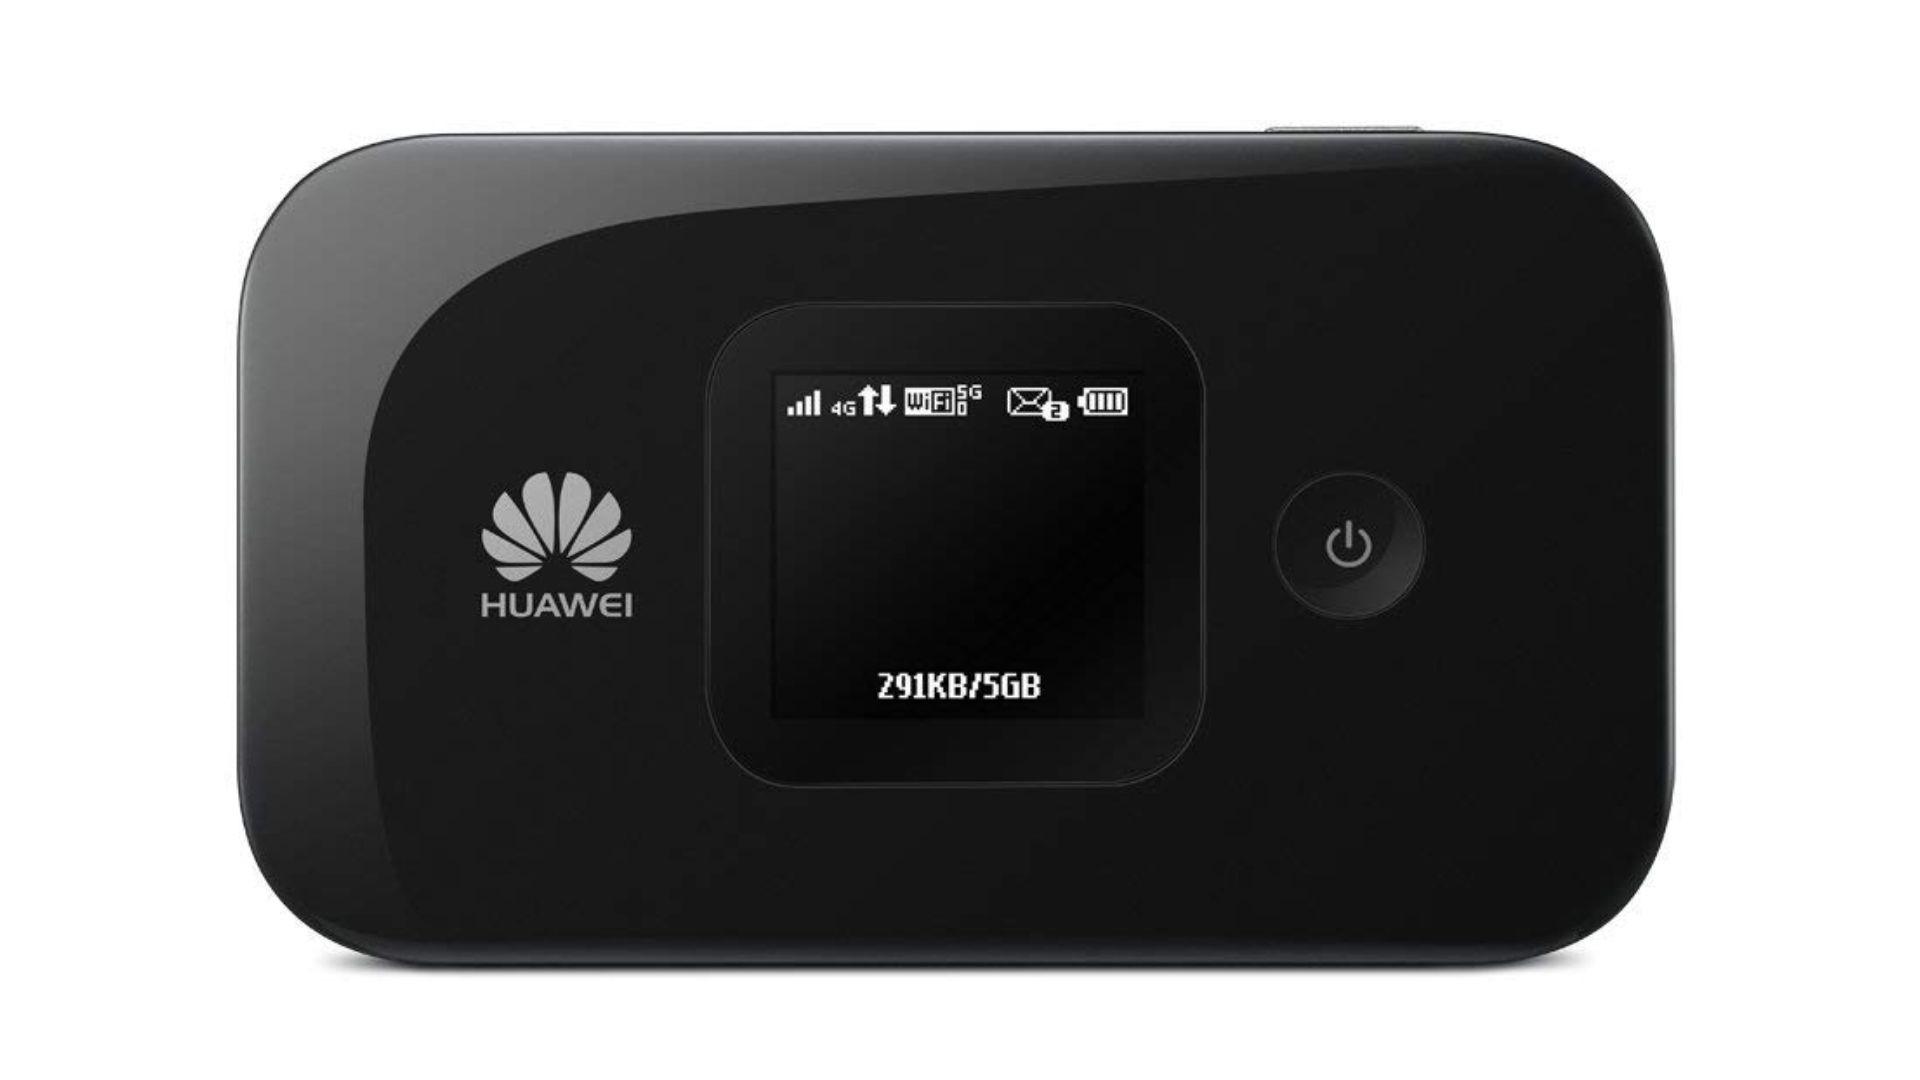 Huawei E5577s-321 150 Mbps 4G LTE Mobile WiFi Hotspot